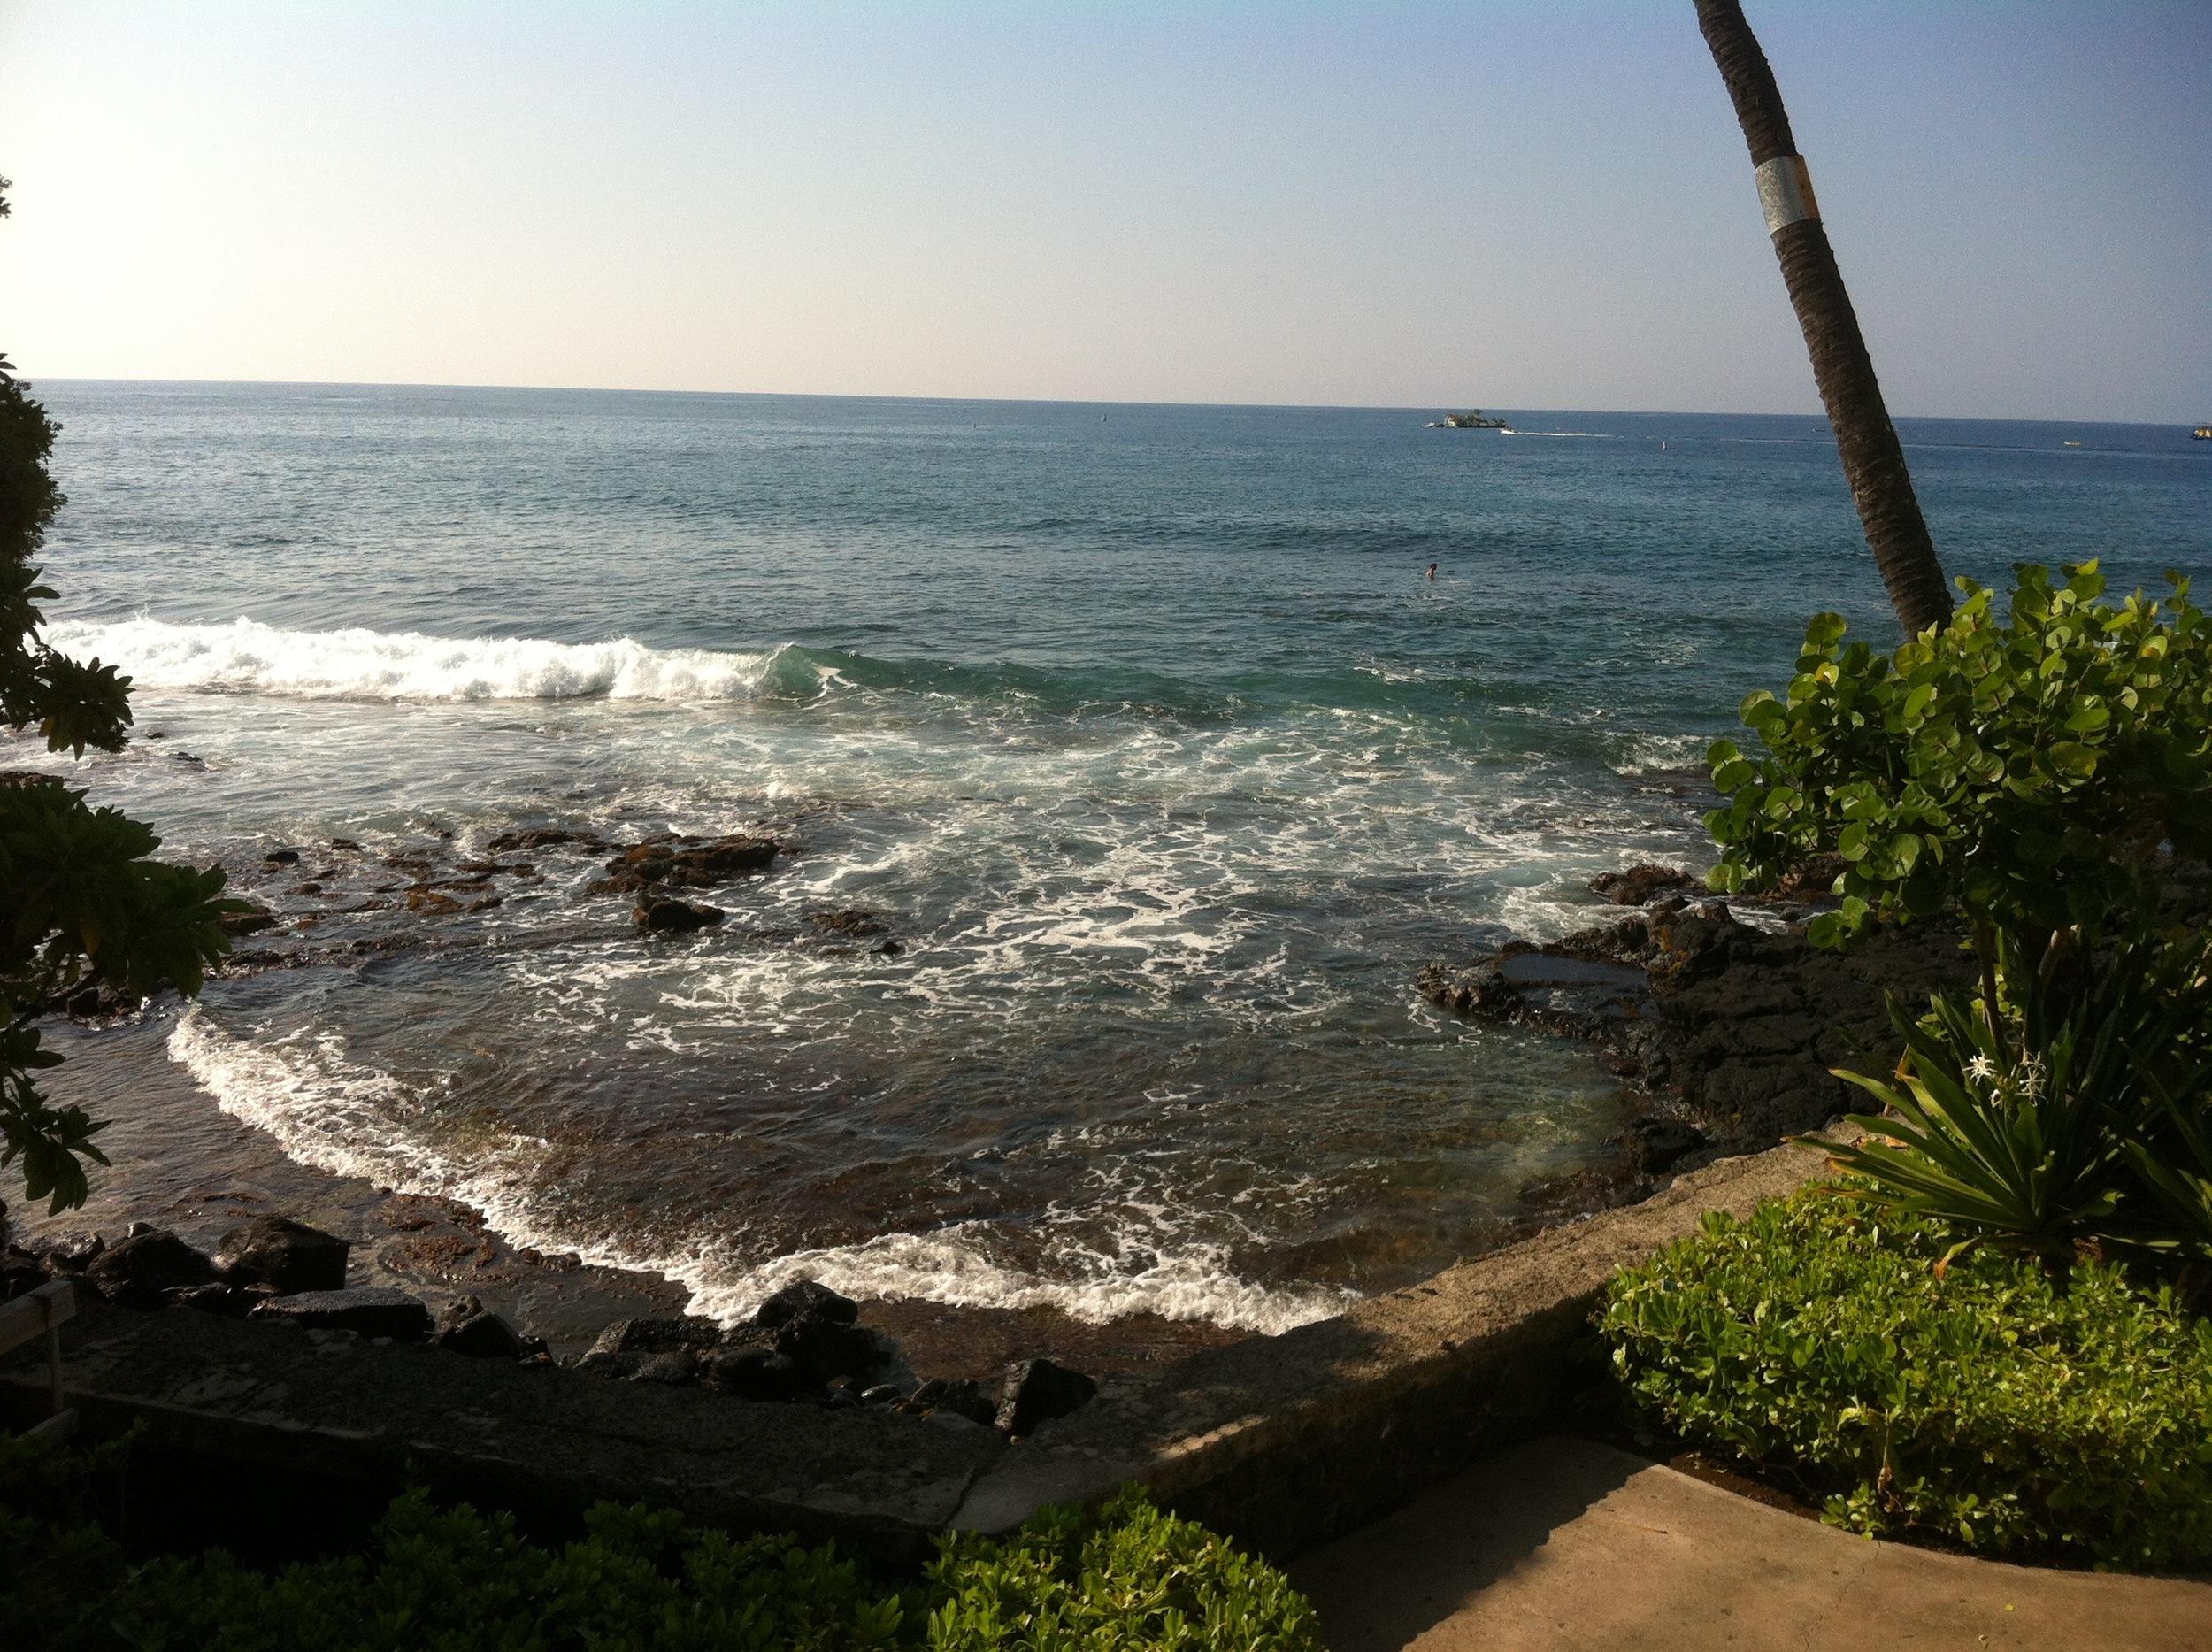 Kona, Hawaii Photo Credit: Caron Somers